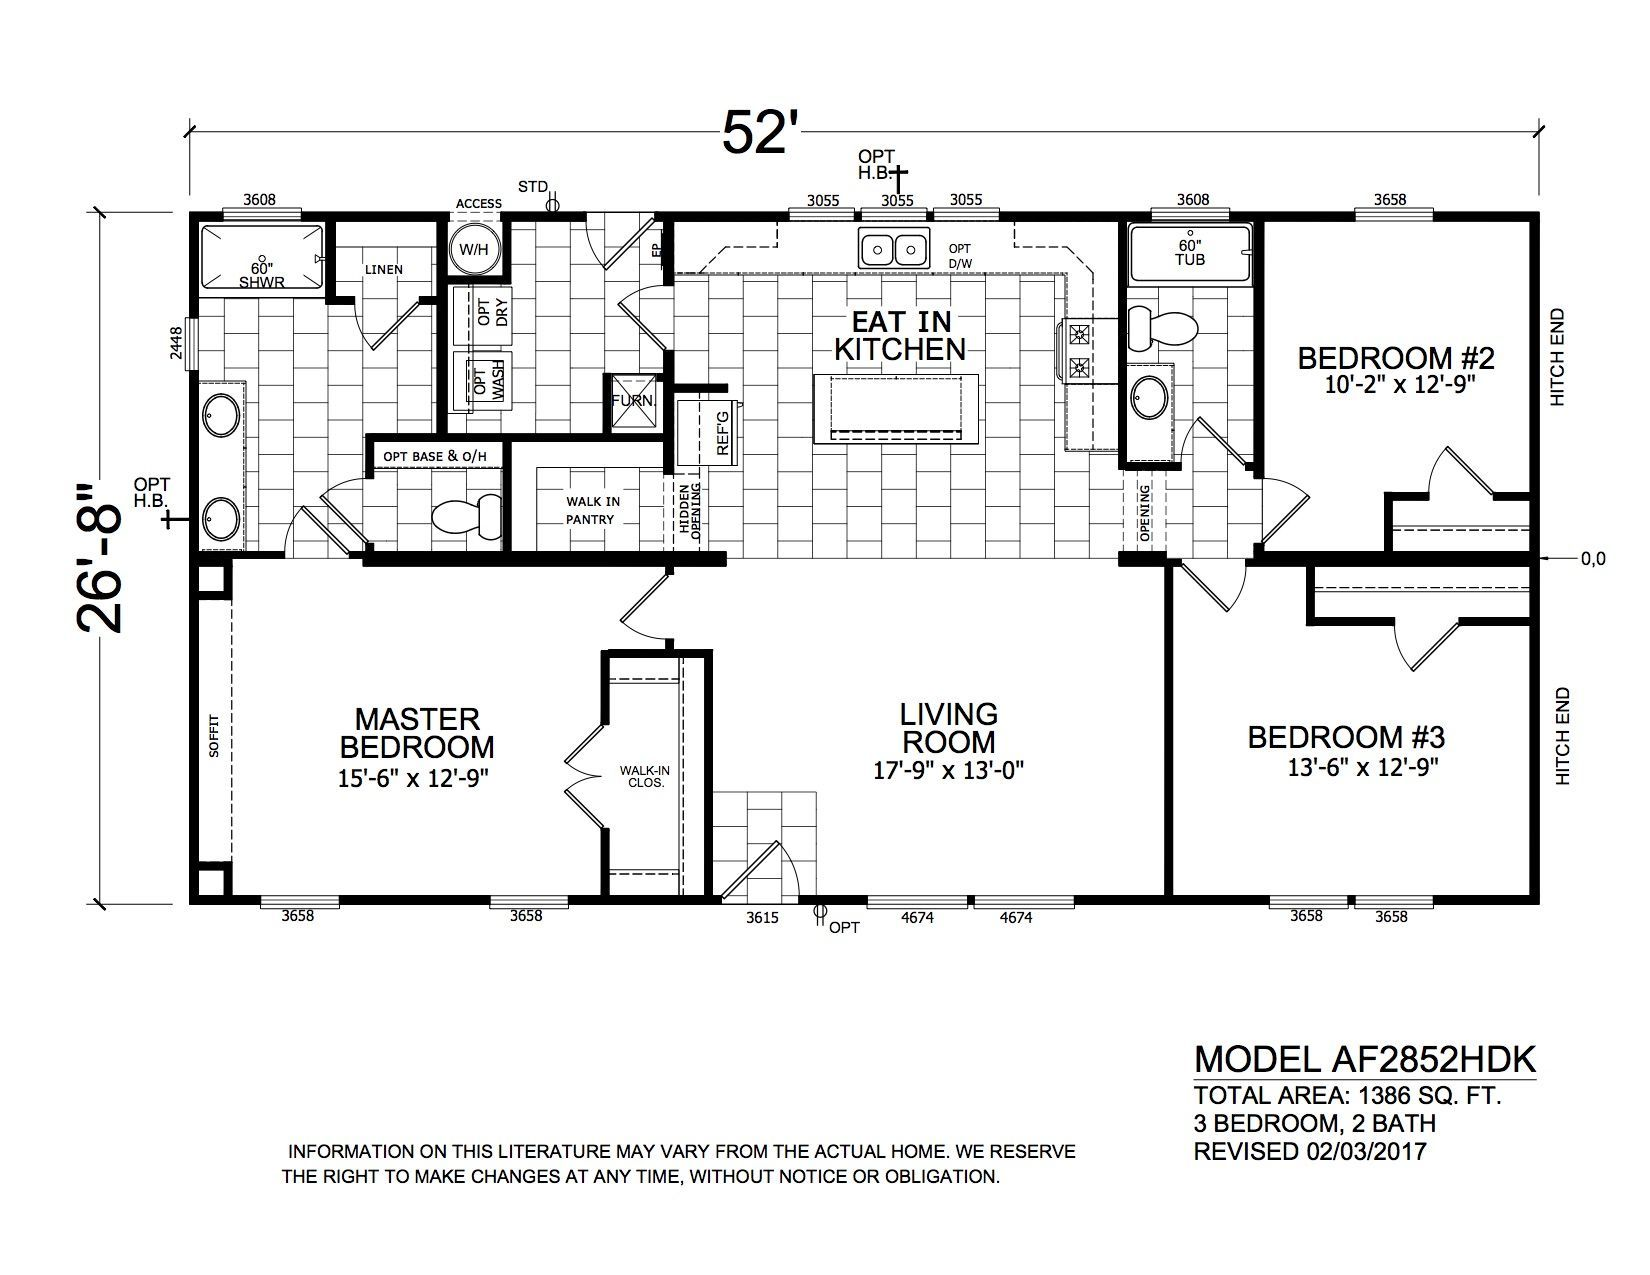 Cactus Modular Home Floor Plans One Level House Plans Cottage Floor Plans